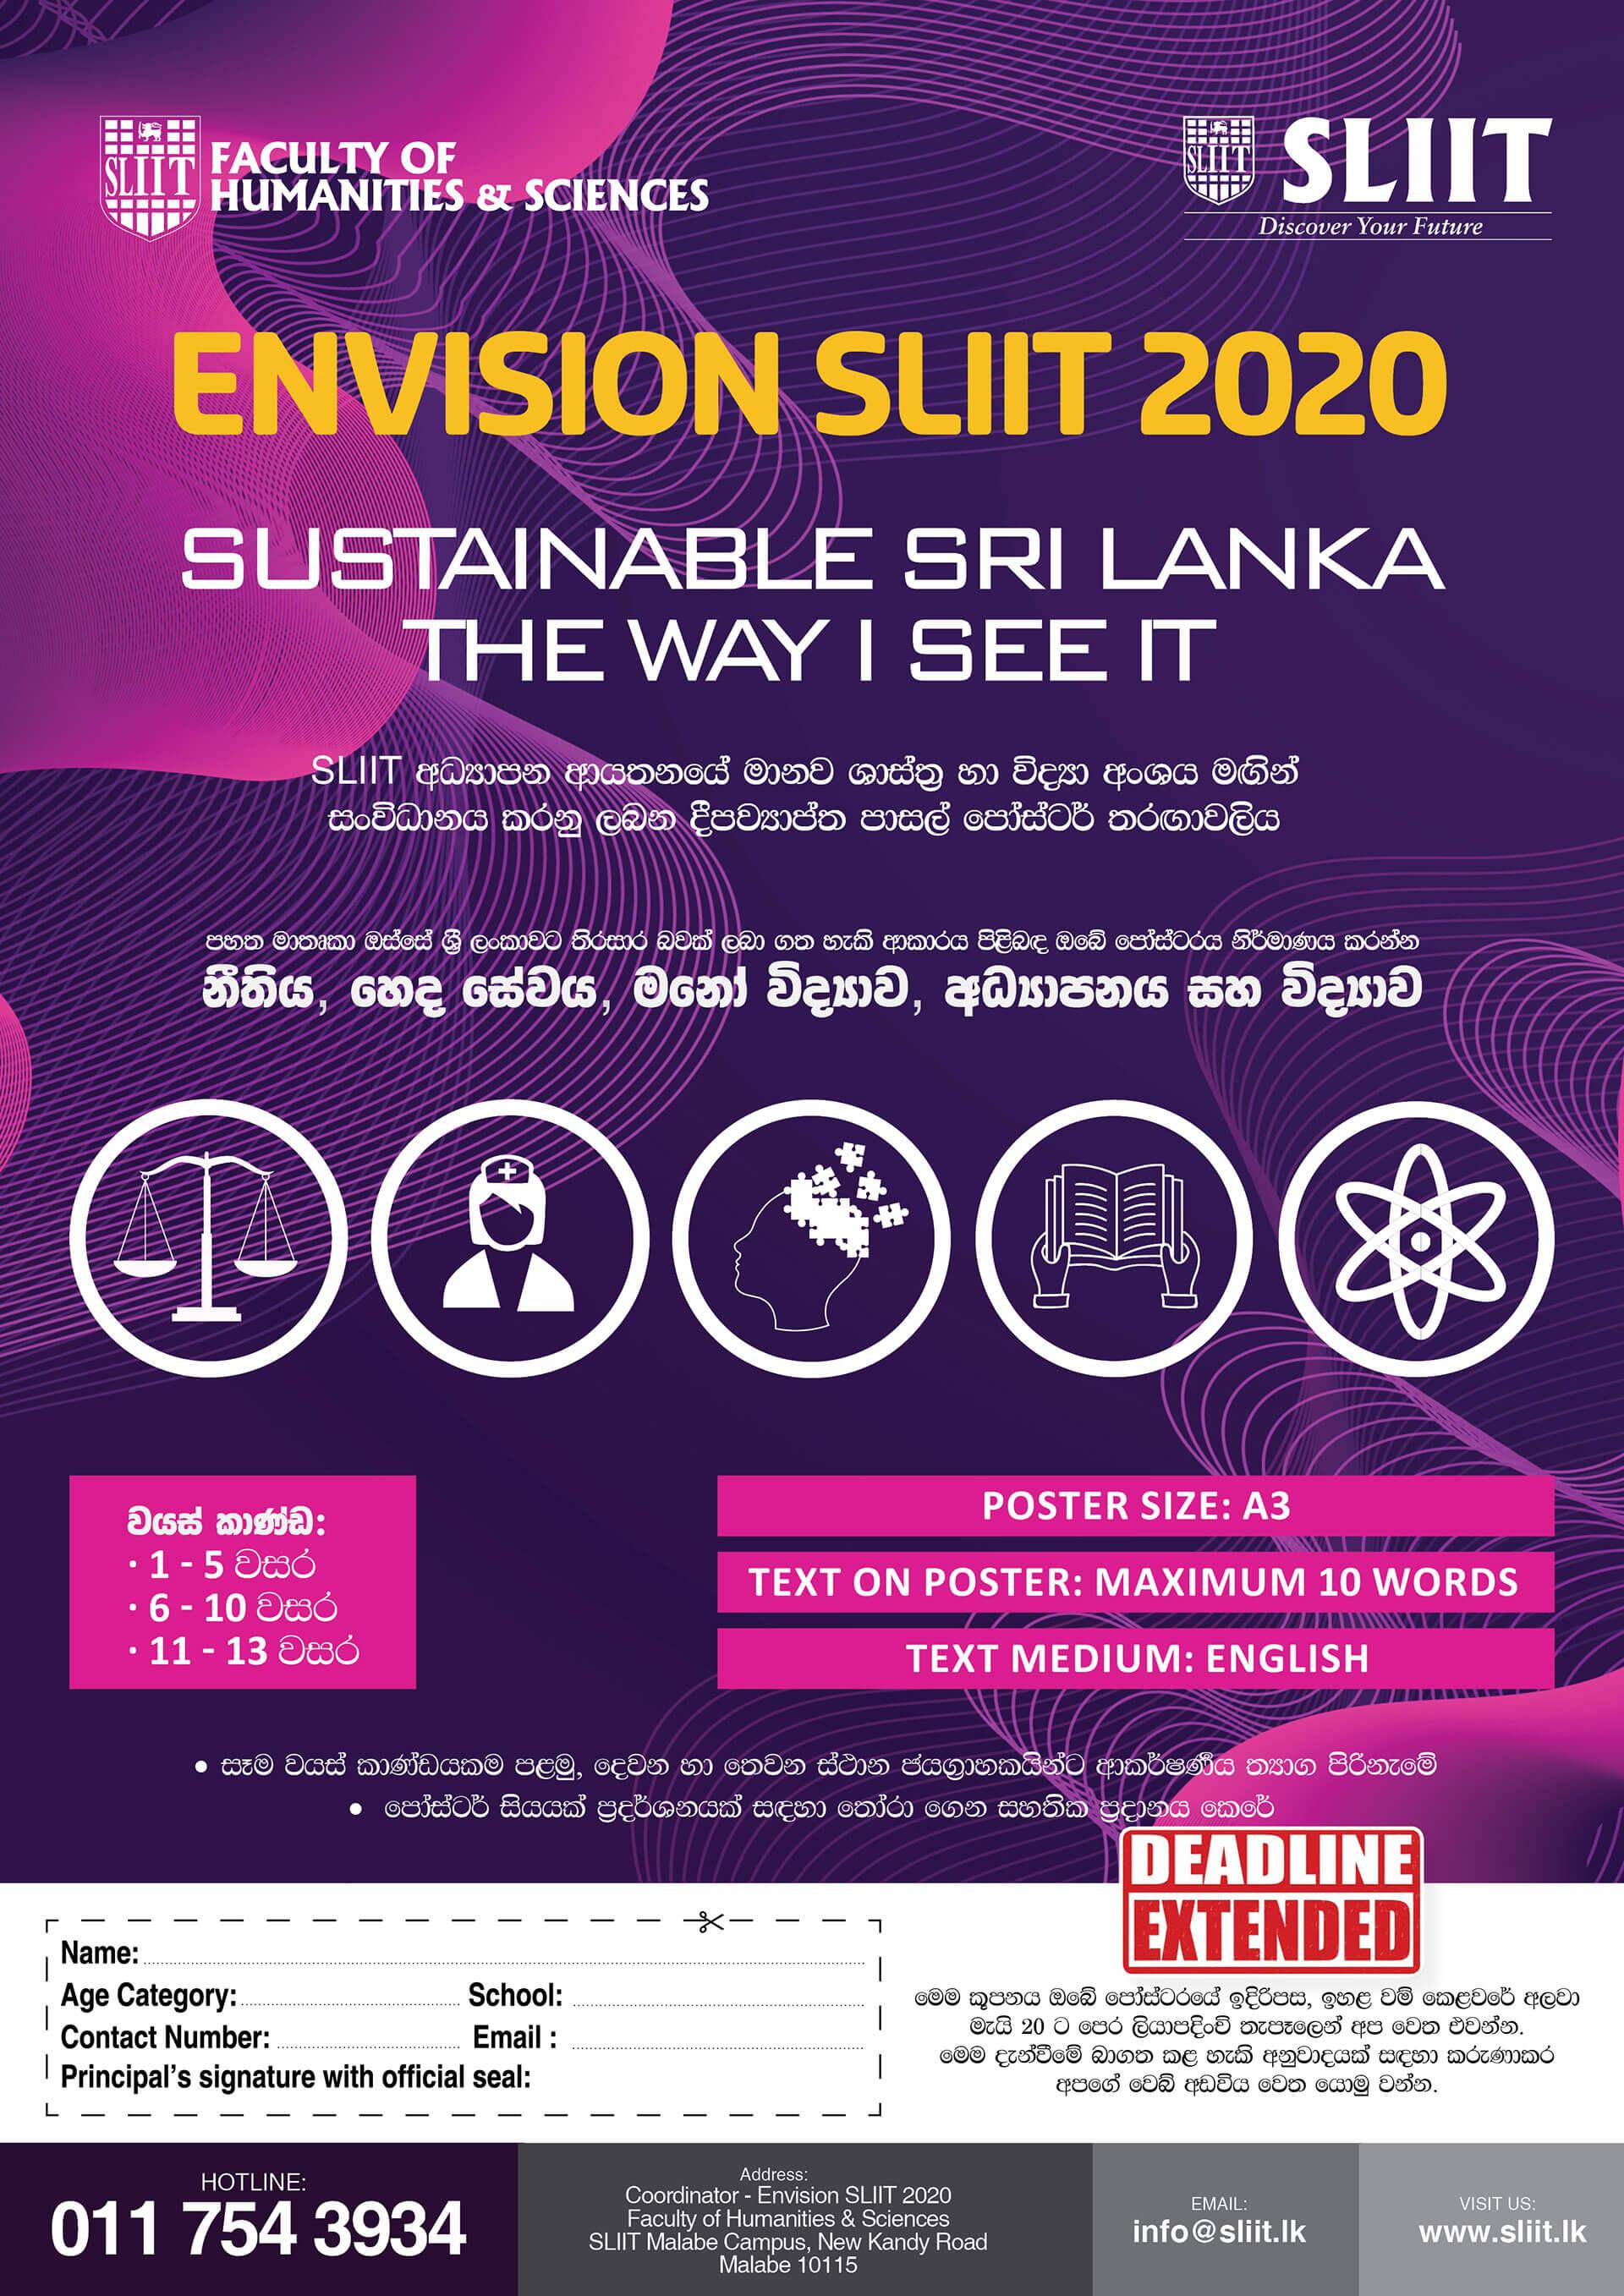 envision-sliit-2020-banner-sin